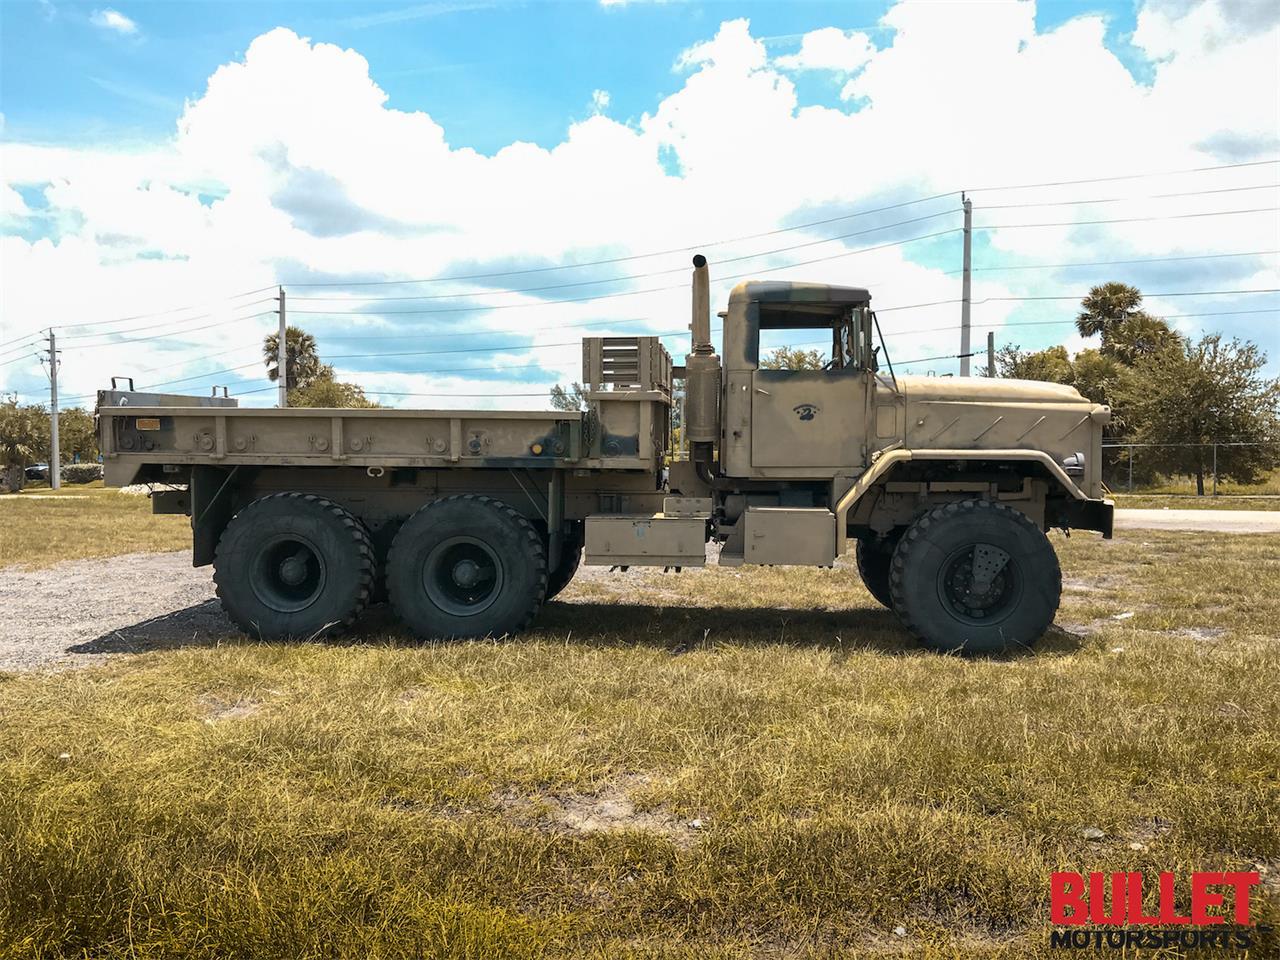 M925 SOUND DRIVER DOWNLOAD FREE